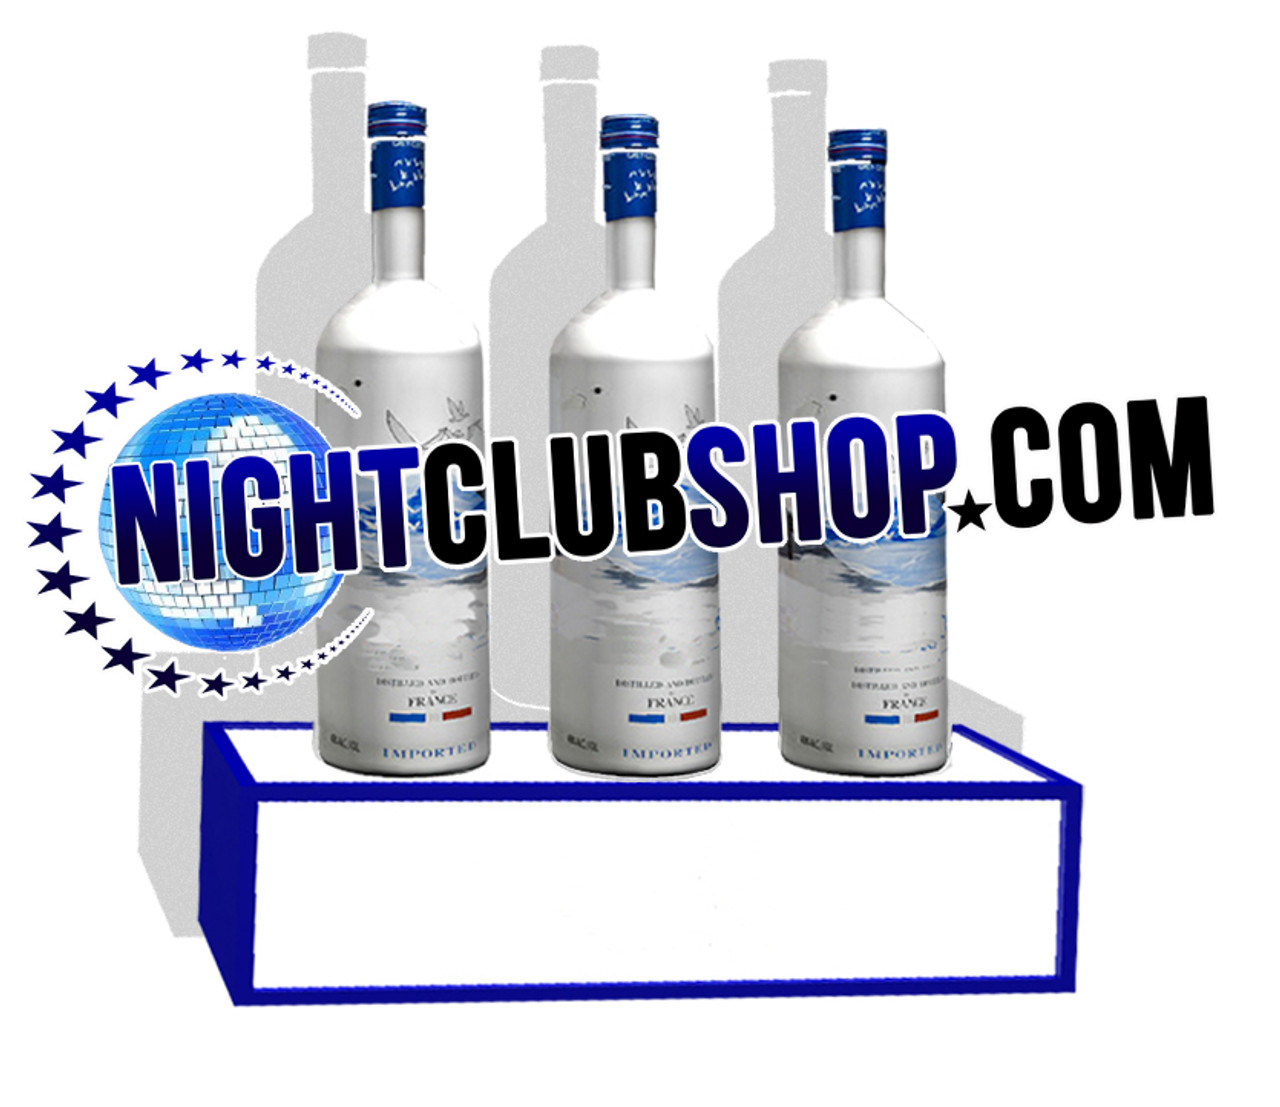 Brand, custom, personalized, Bar, stand, shelf, Liquor, Bottle, Base, engrave, etch, print, Light up, illuminated, Nightclubshop, custom shop